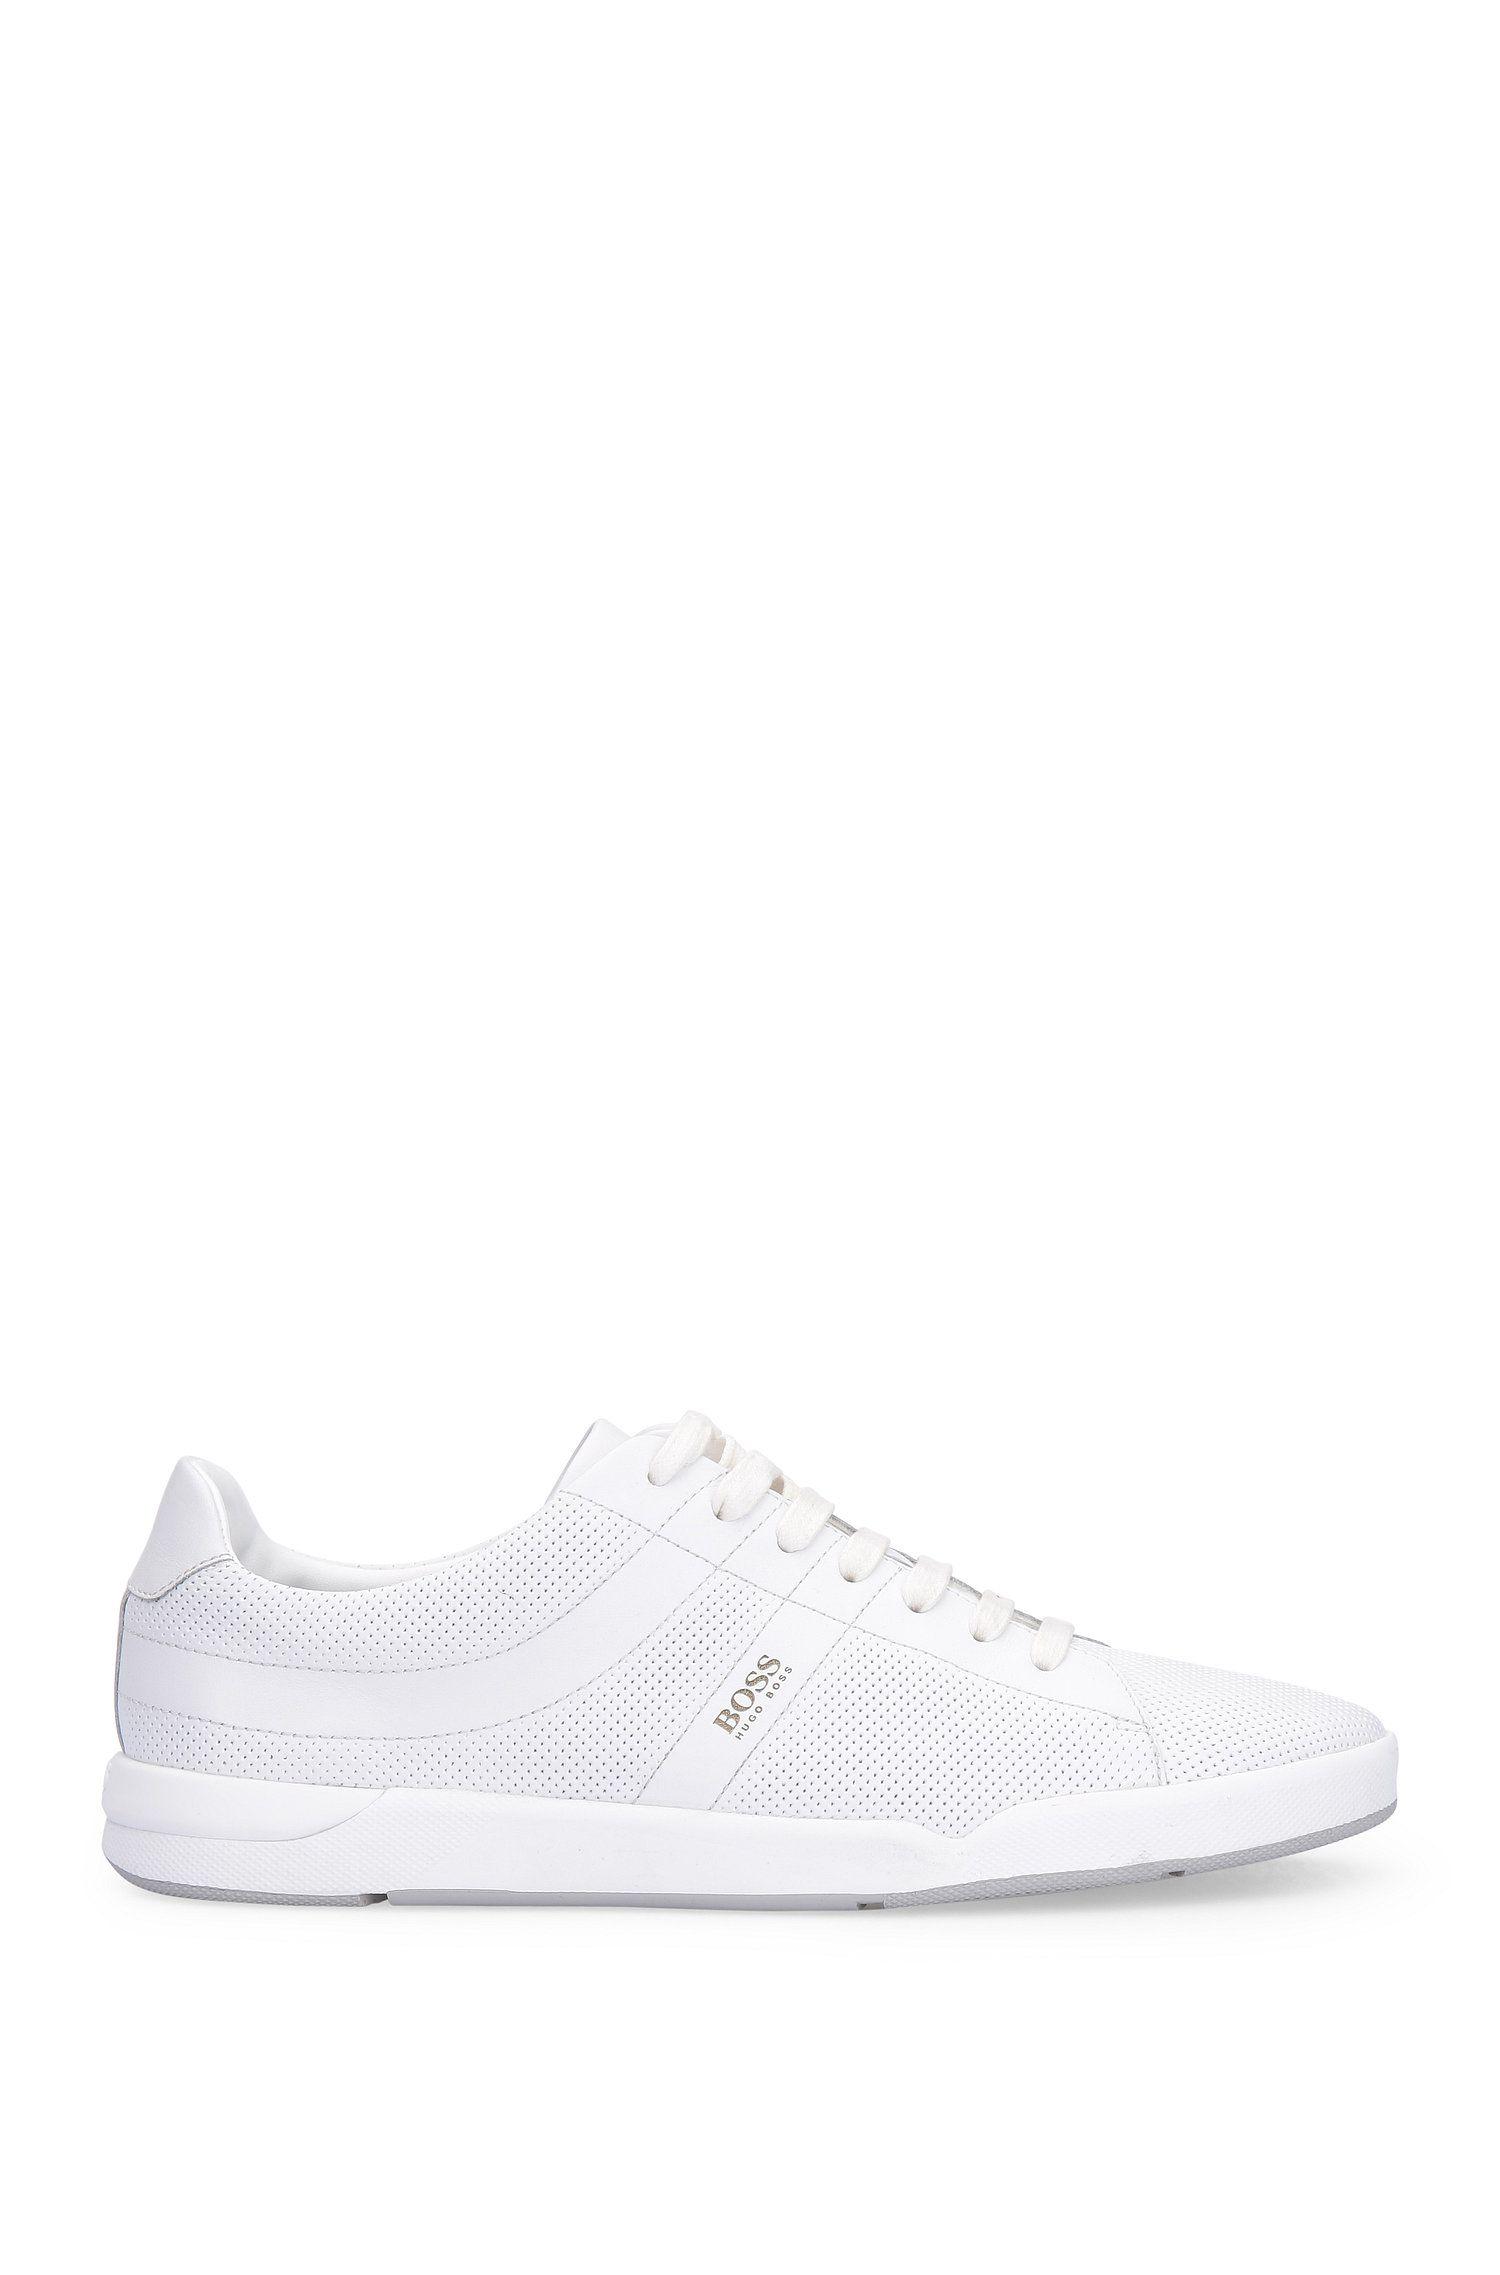 'Stillnes Tenn ltpf'   Leather Perforated Sneakers